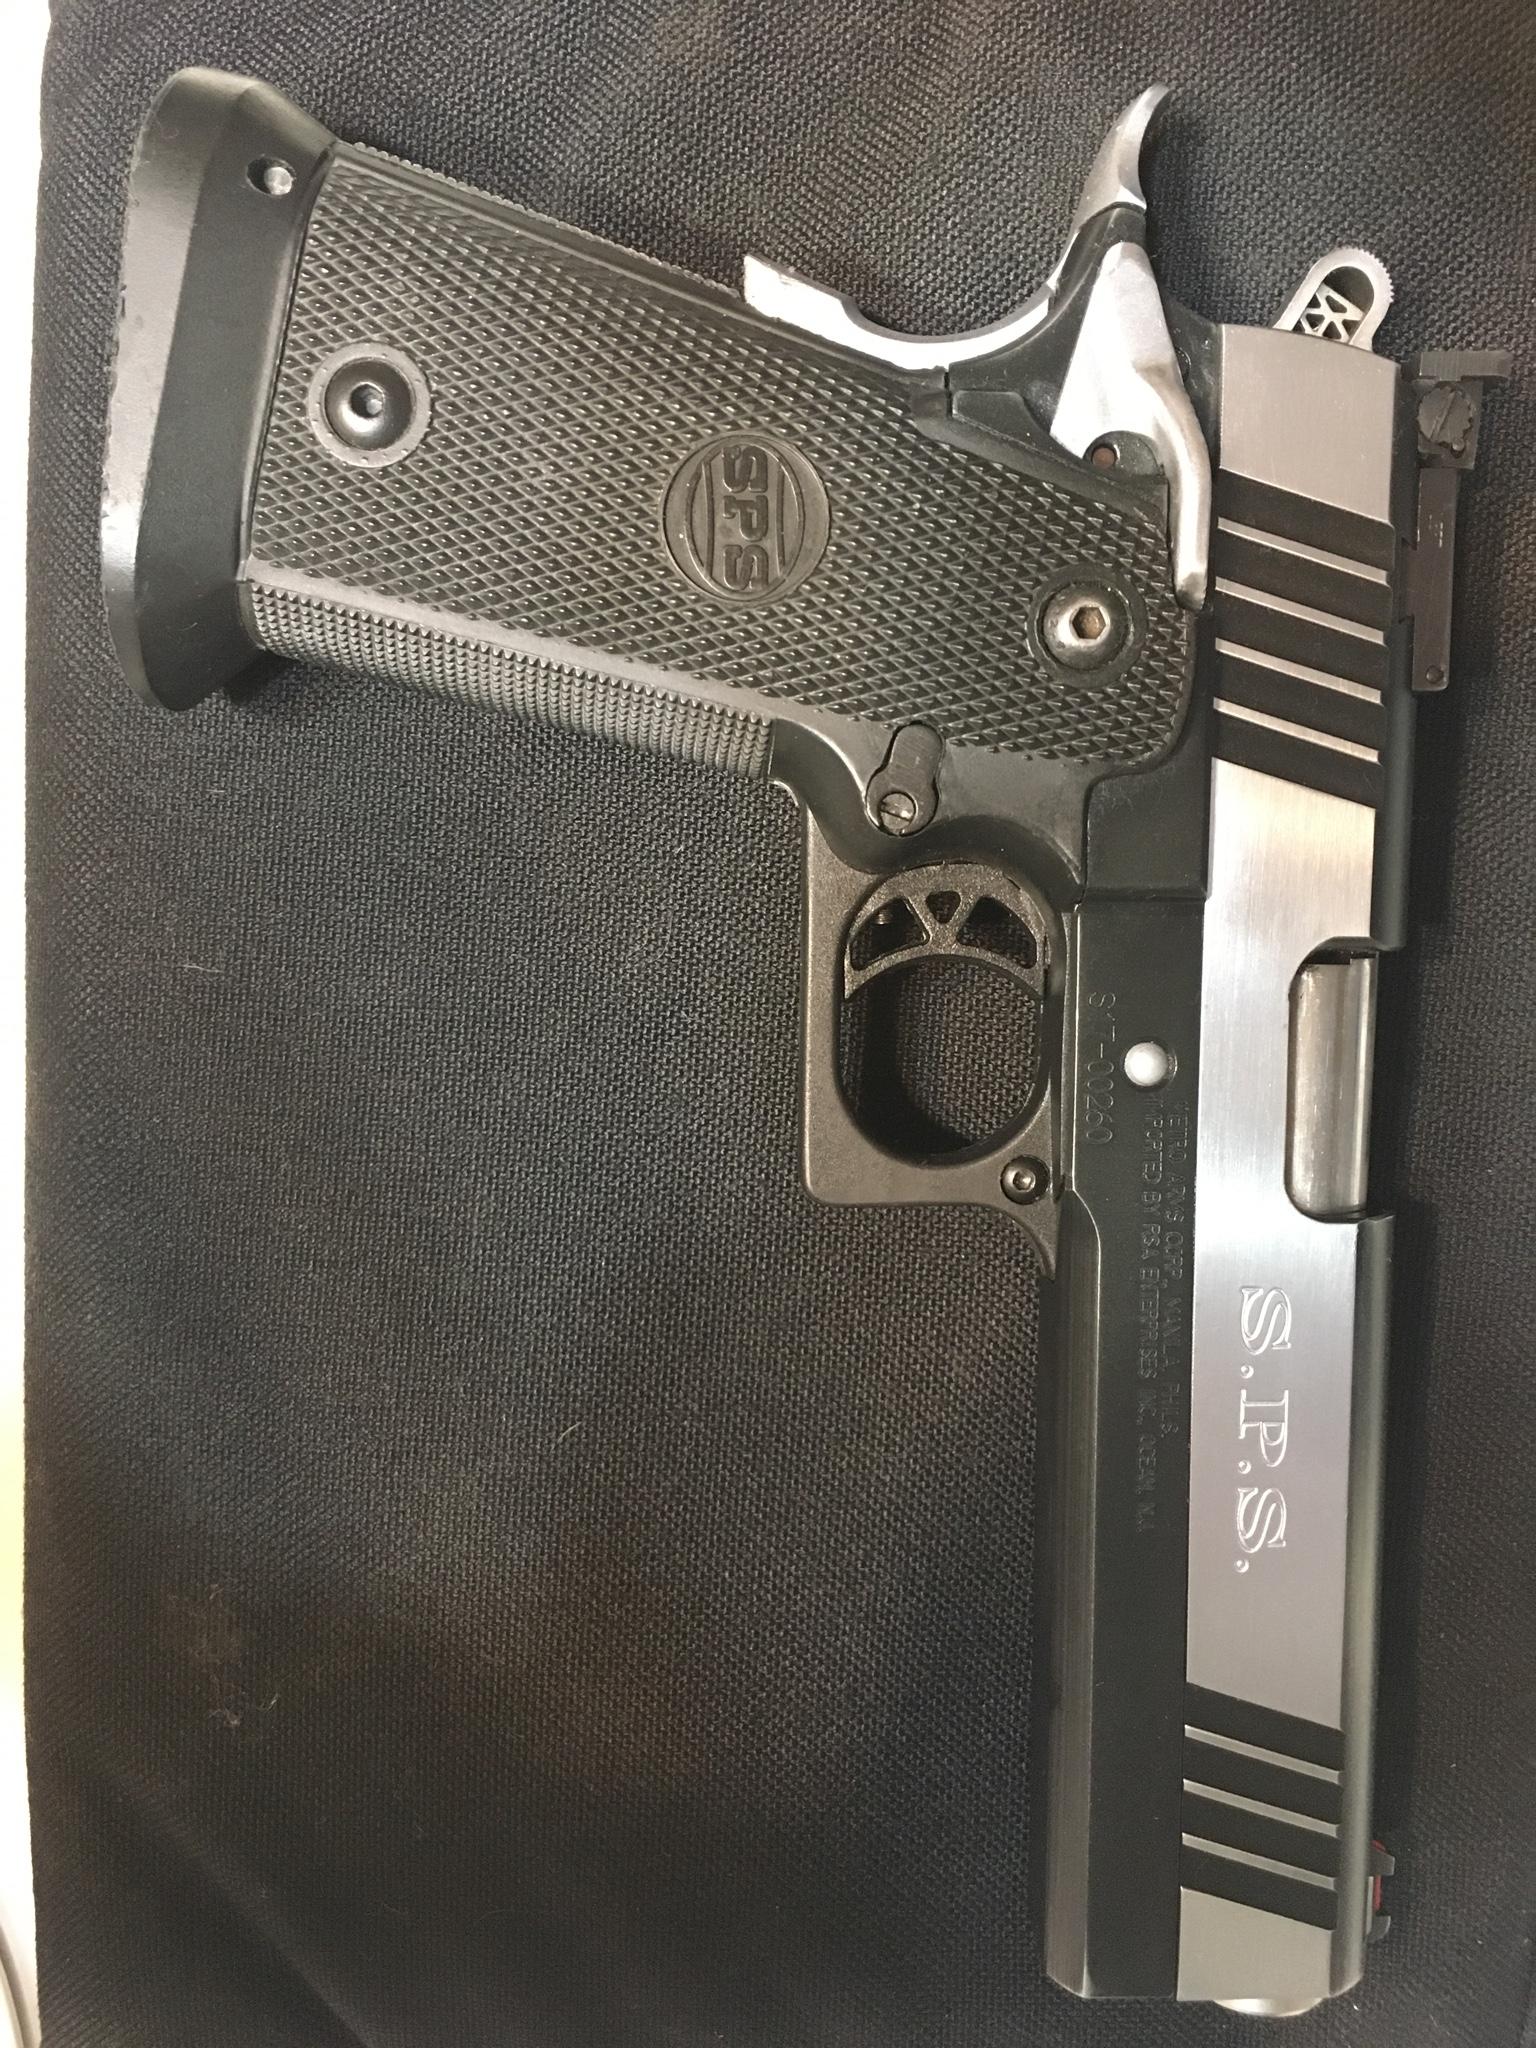 WTS Two-tone SPS Pantera 2011 9mm - AR15 COM